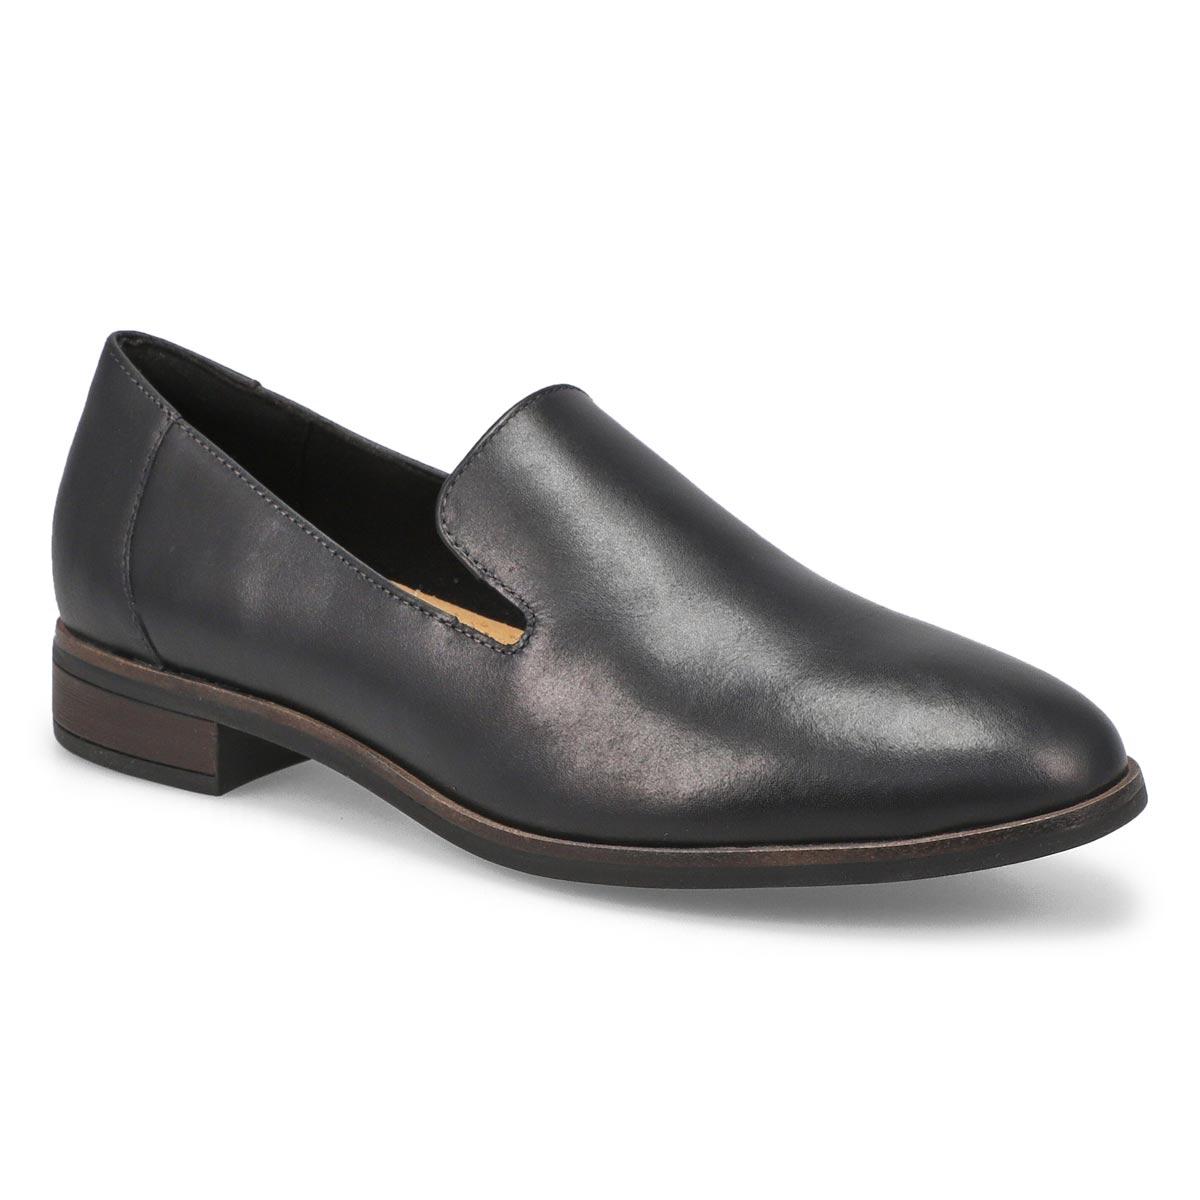 Women's Trish Style Dress Loafer - Black